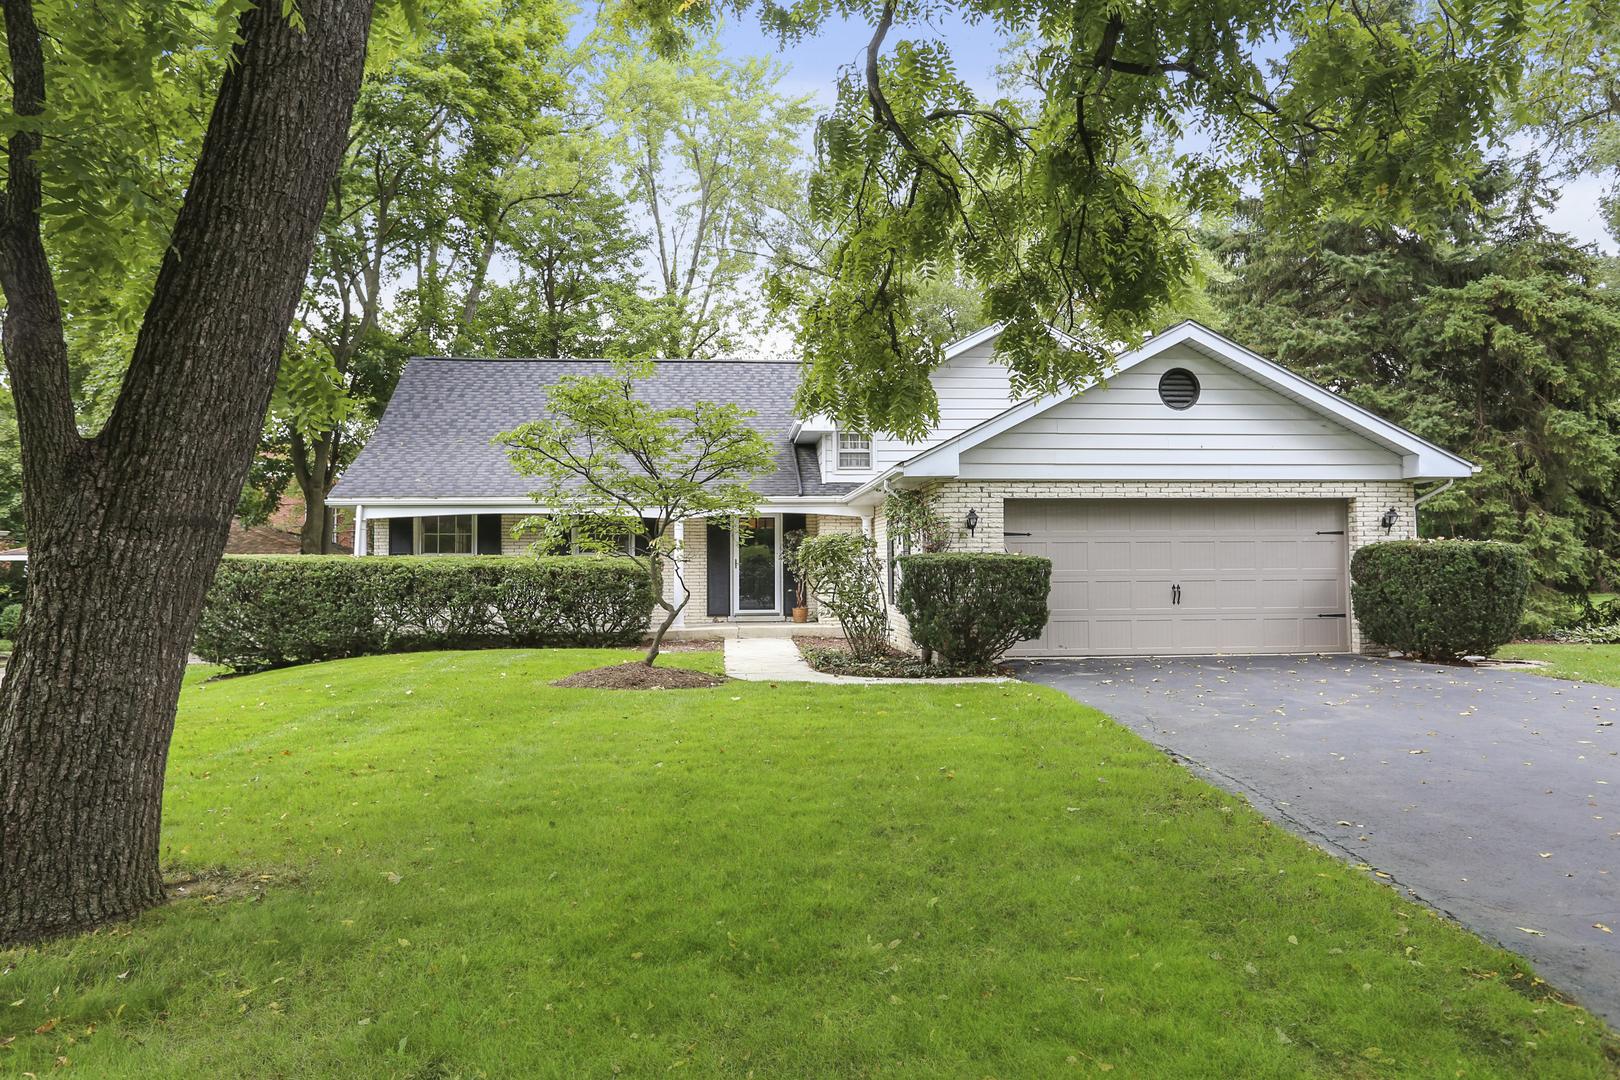 905 Oakwood Terrace, Hinsdale, Illinois 60521